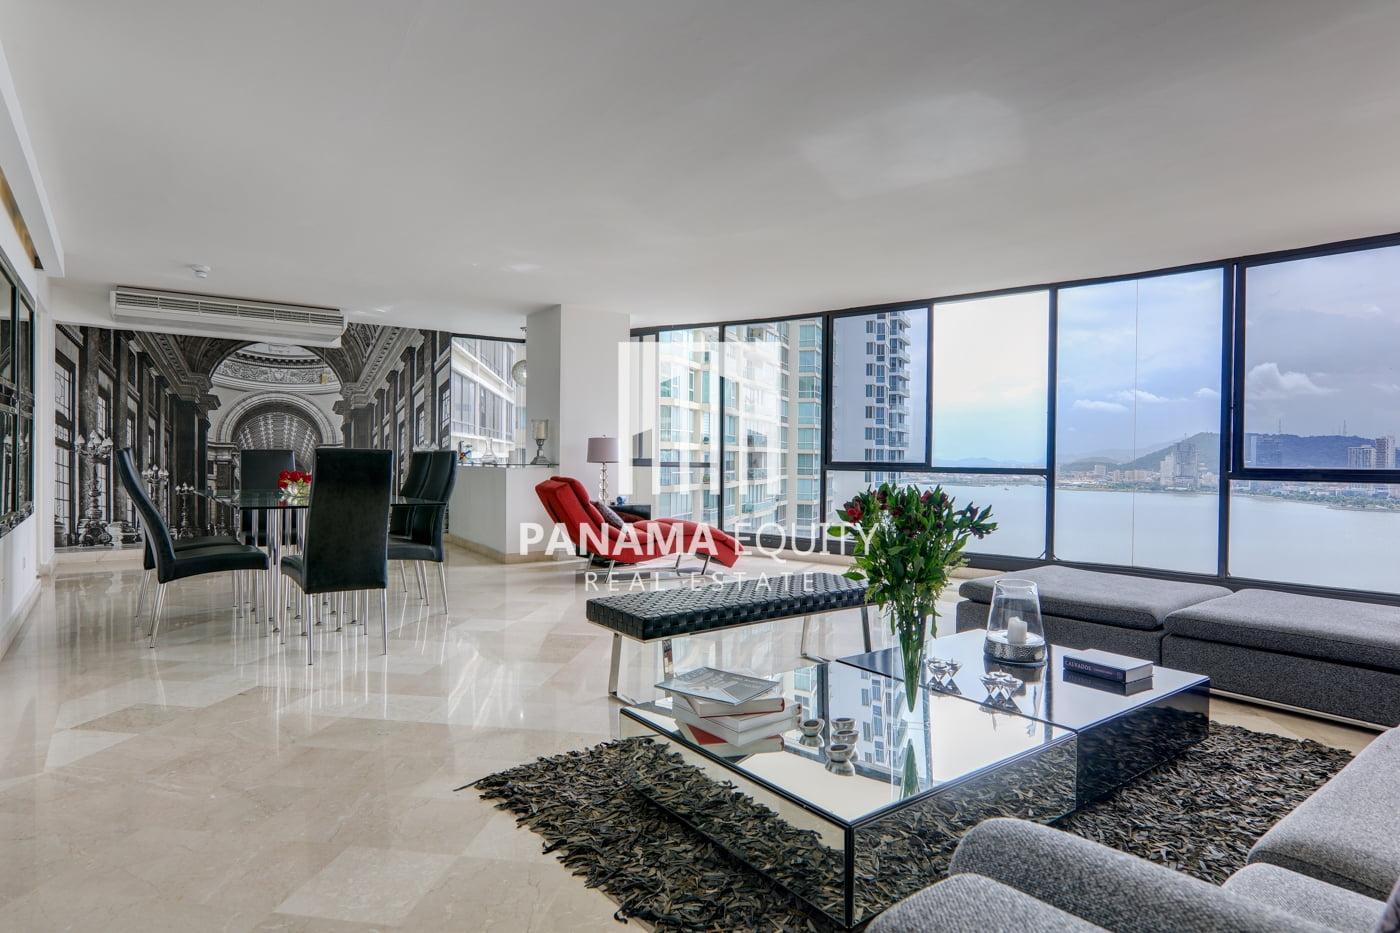 Three-Bedroom Apartment for Sale in Mar de Plata Paitilla!